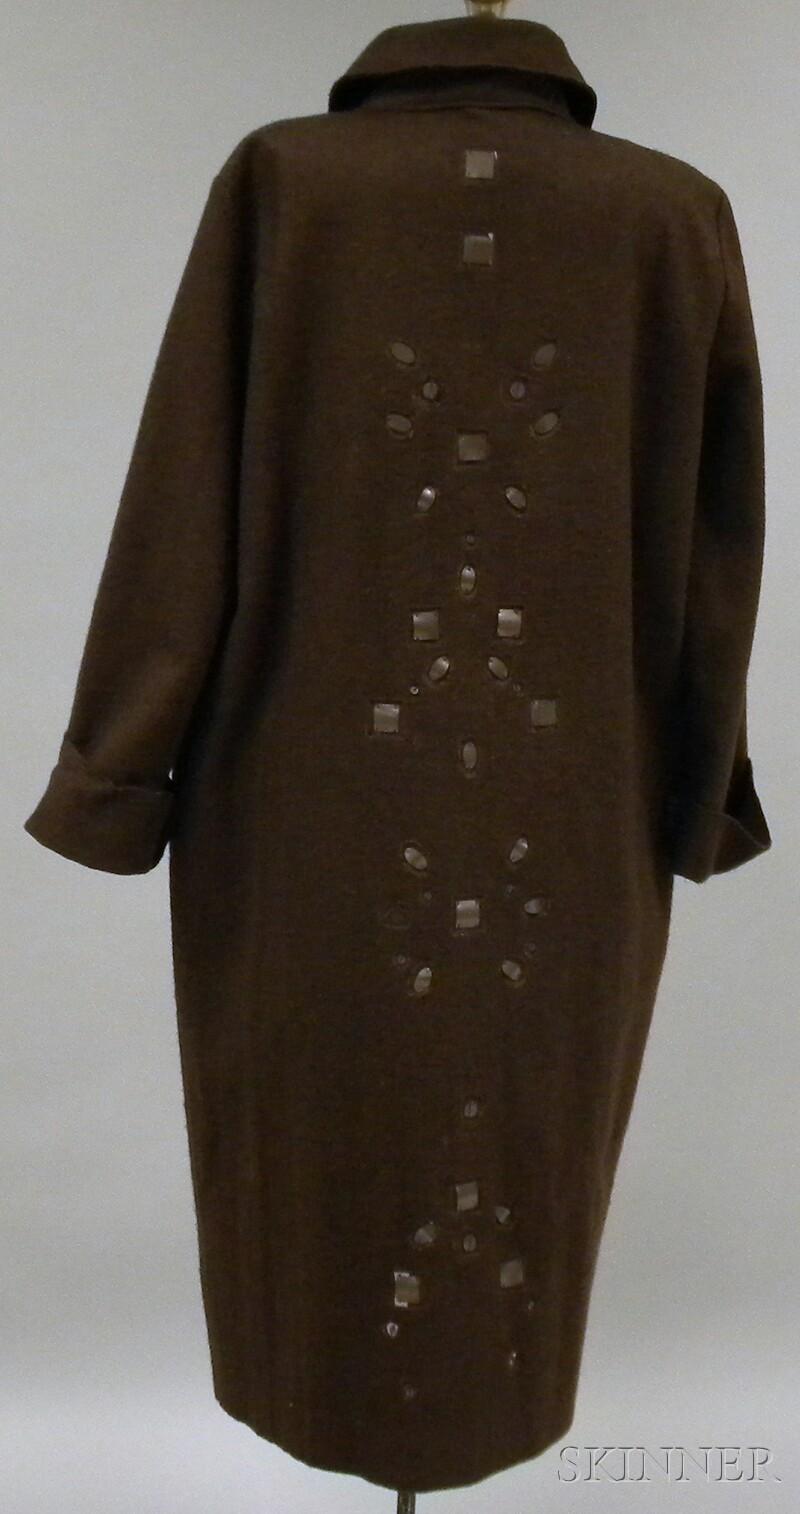 Gianfranco Ferre Brown Felted Wool Coat